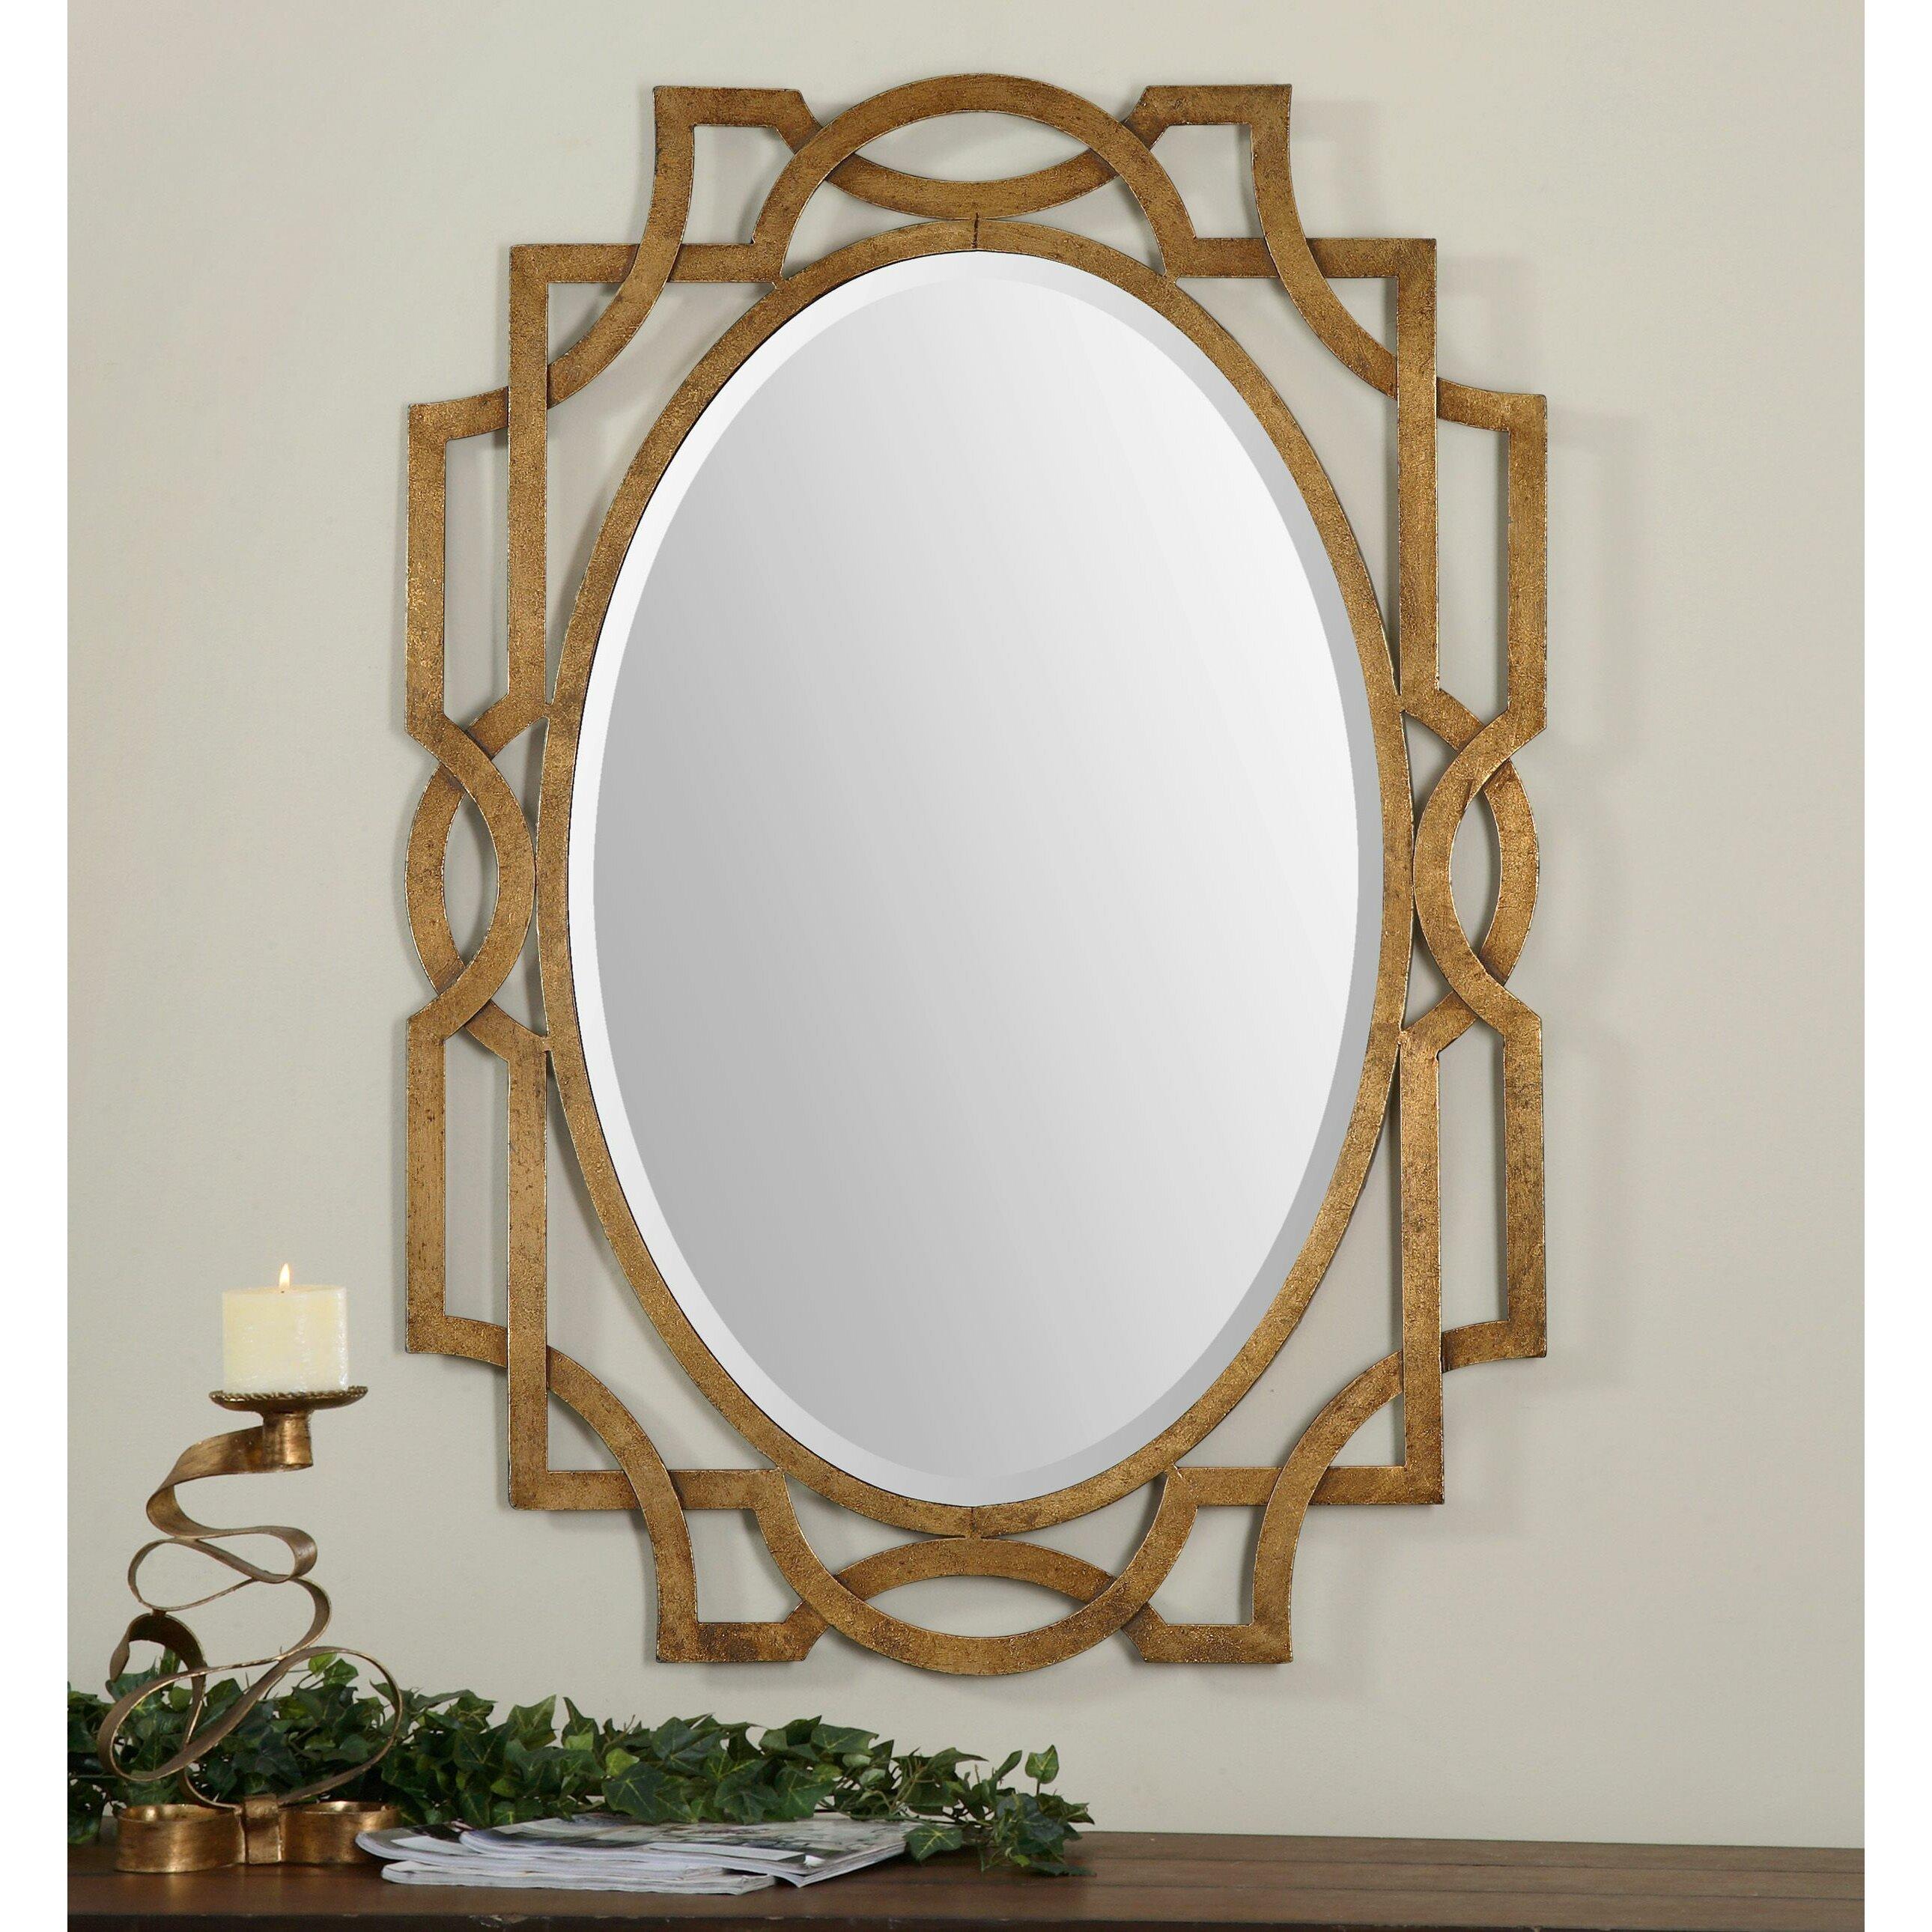 Vivian Wall Mirror By Uttermost: Uttermost Margutta Wall Mirror & Reviews